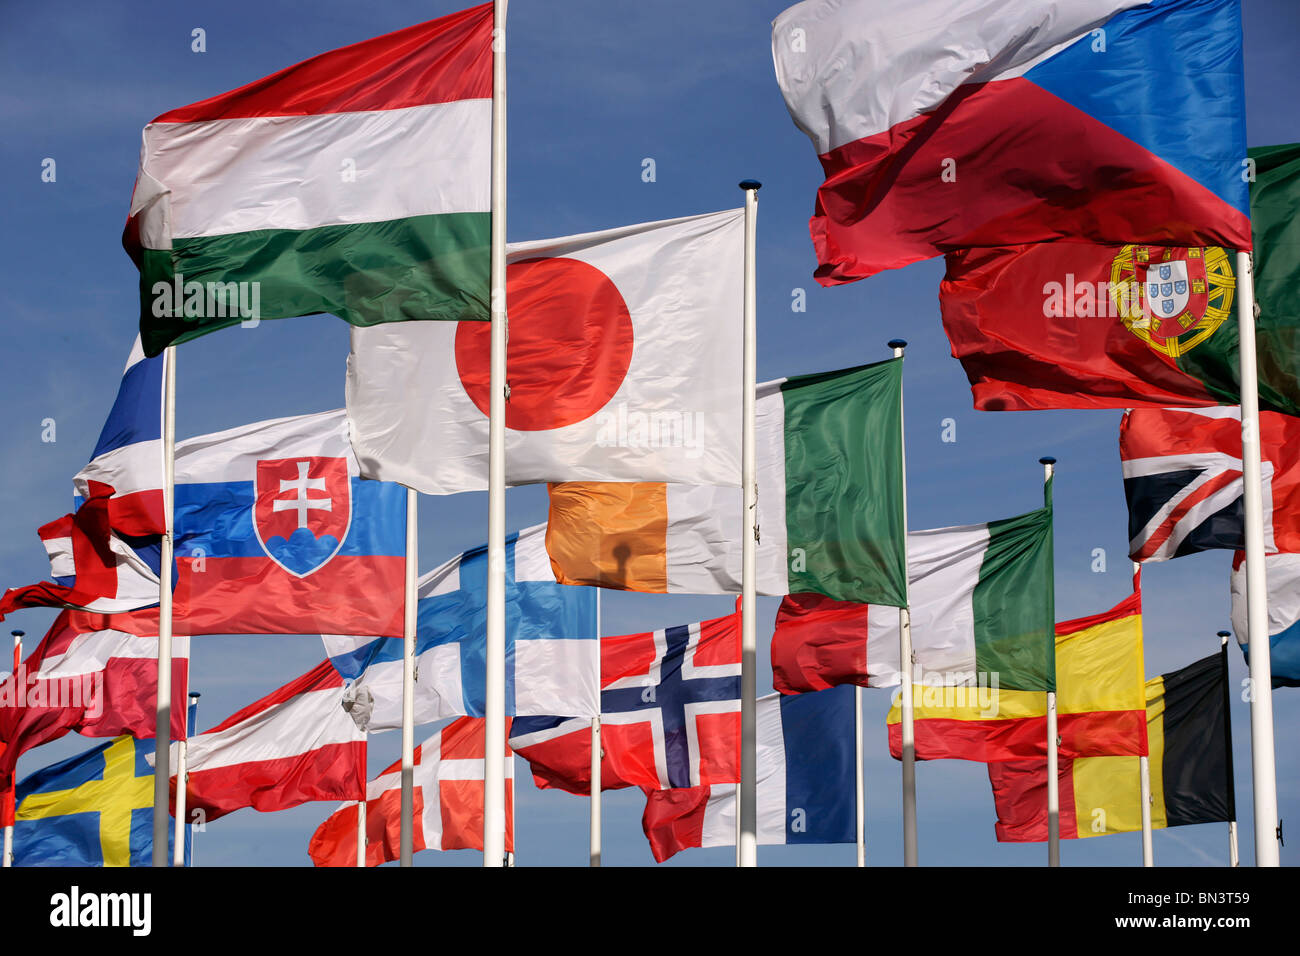 National flags fluttering against sky - Stock Image